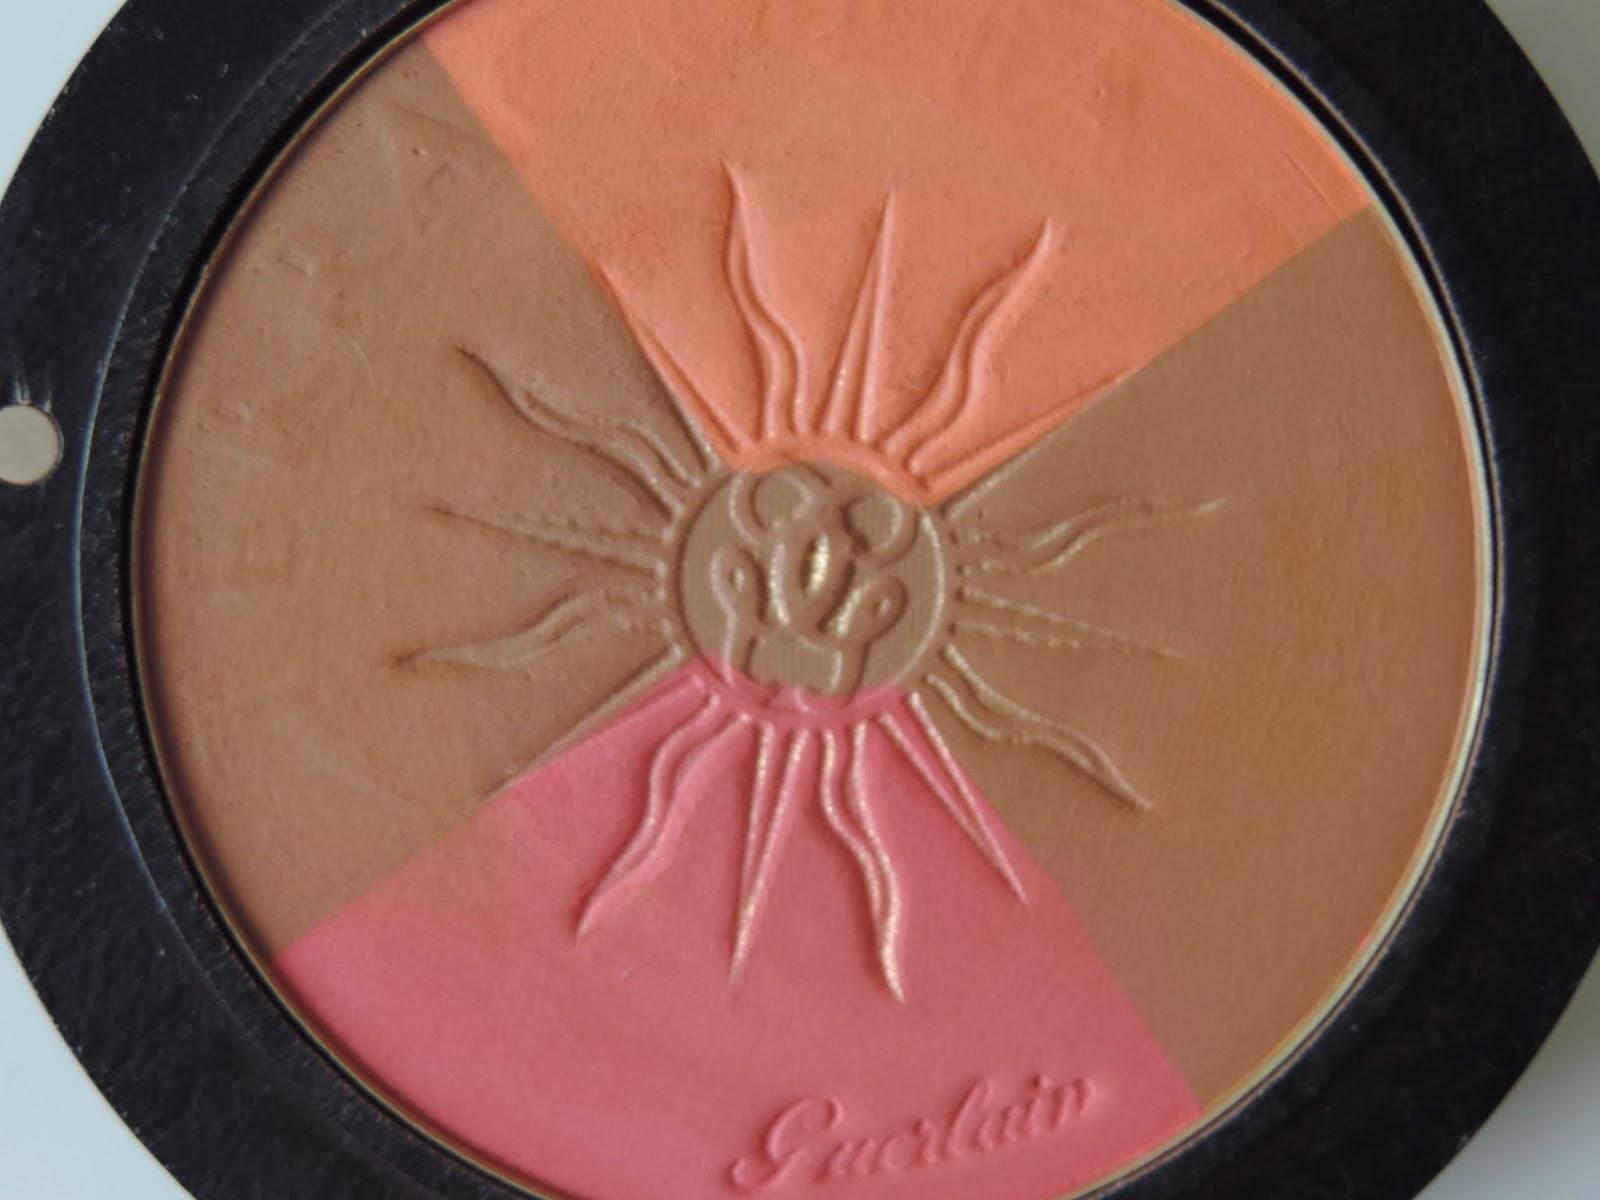 Guerlain Terracotta Sun Celebration Bronzing Powder & Blush